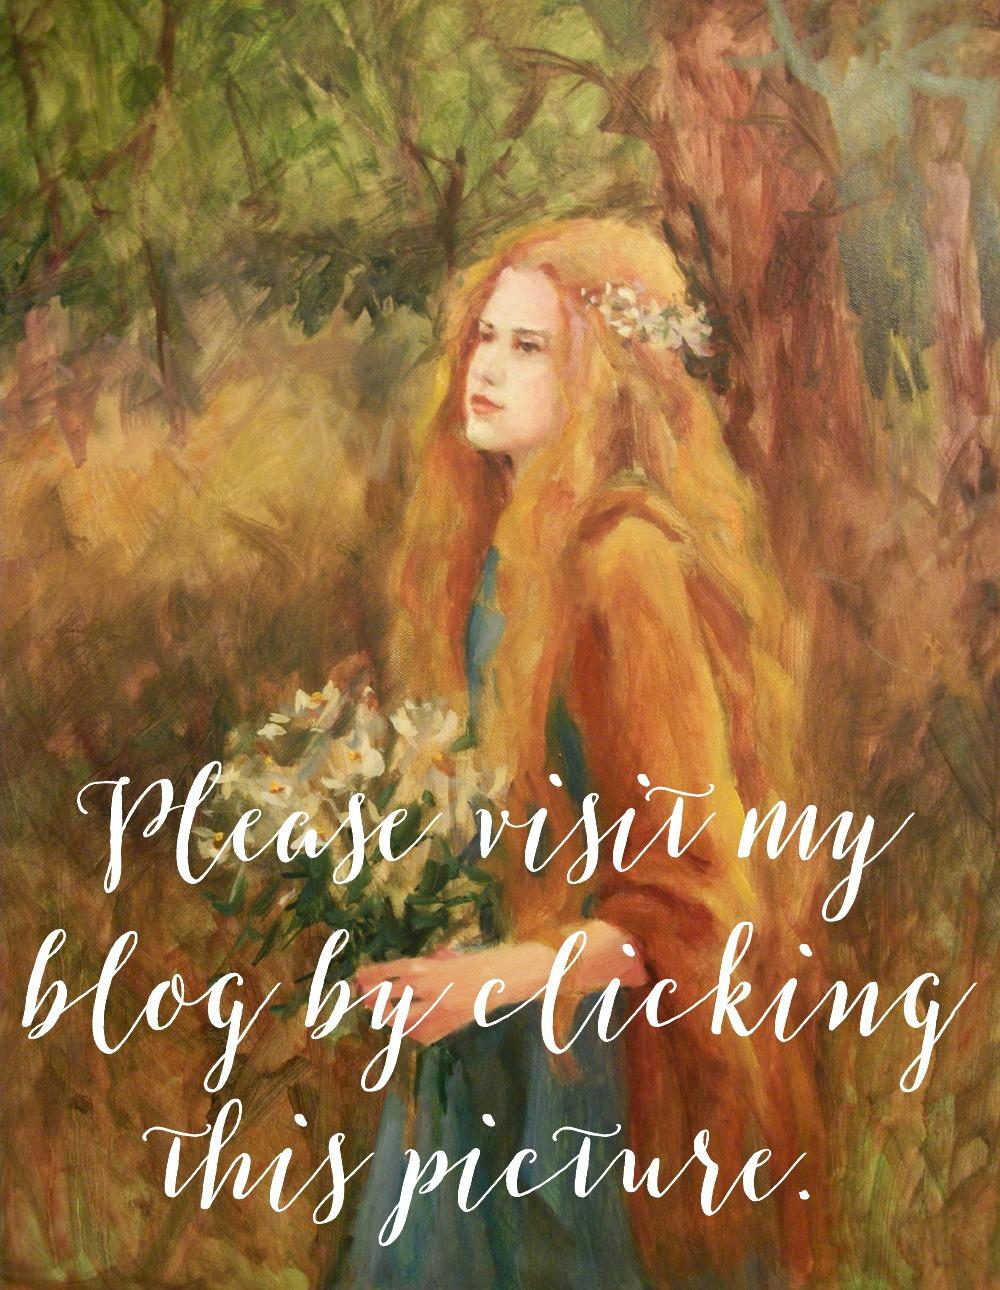 Follow me at ~ Bookishkind.blogspot.com